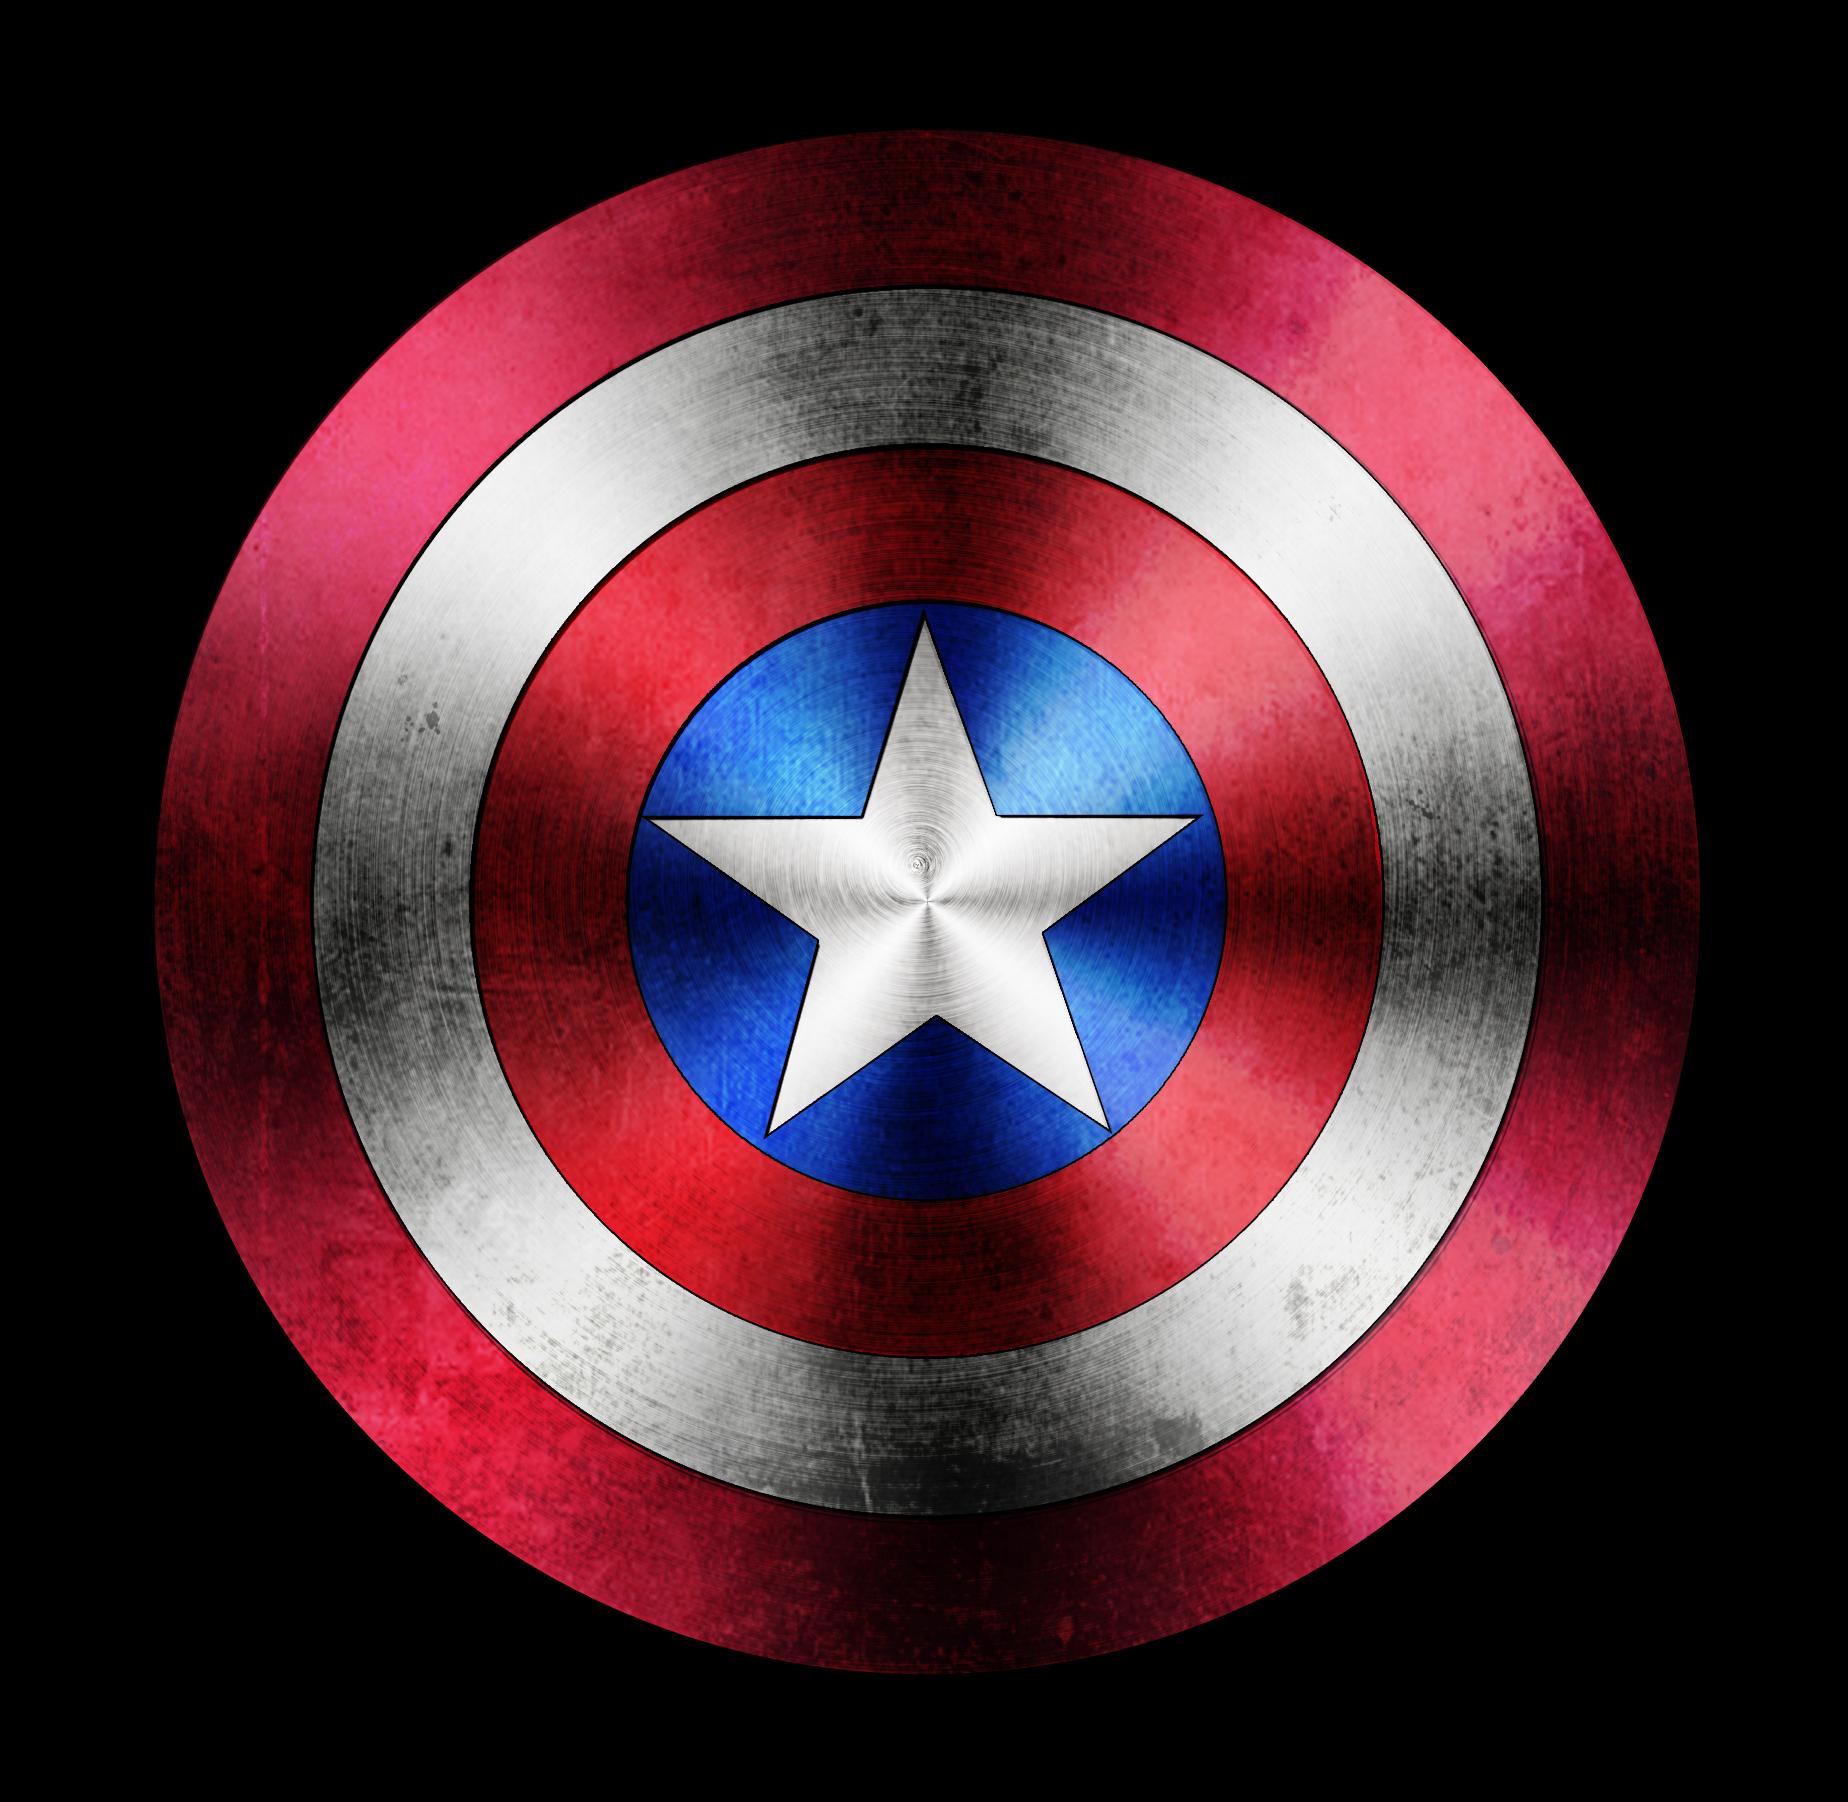 Captain america shield by ryan godolphin at coroflot com